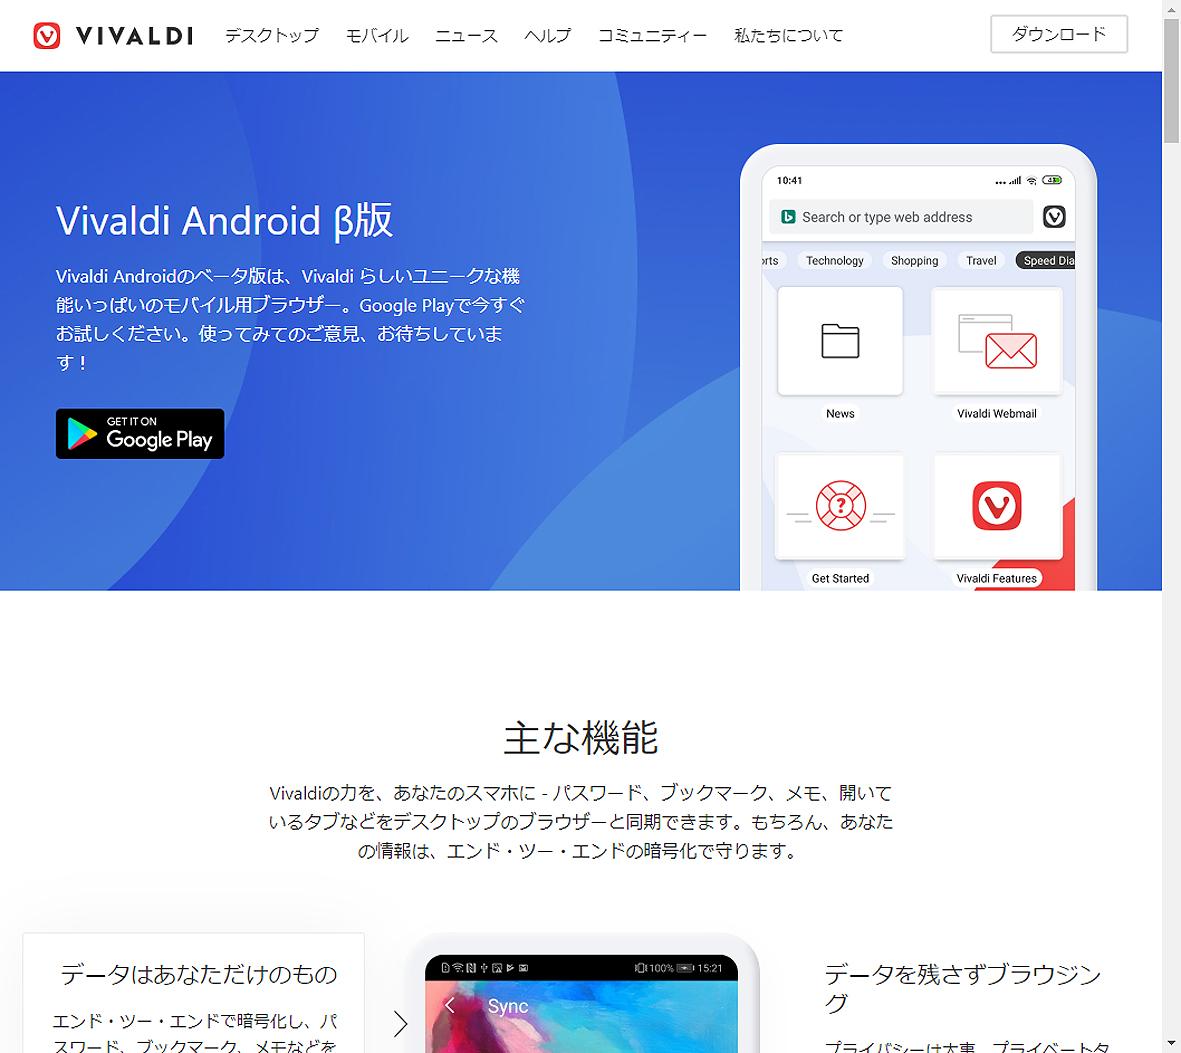 Vivaldi の評価・使い方 - フリーソフト100